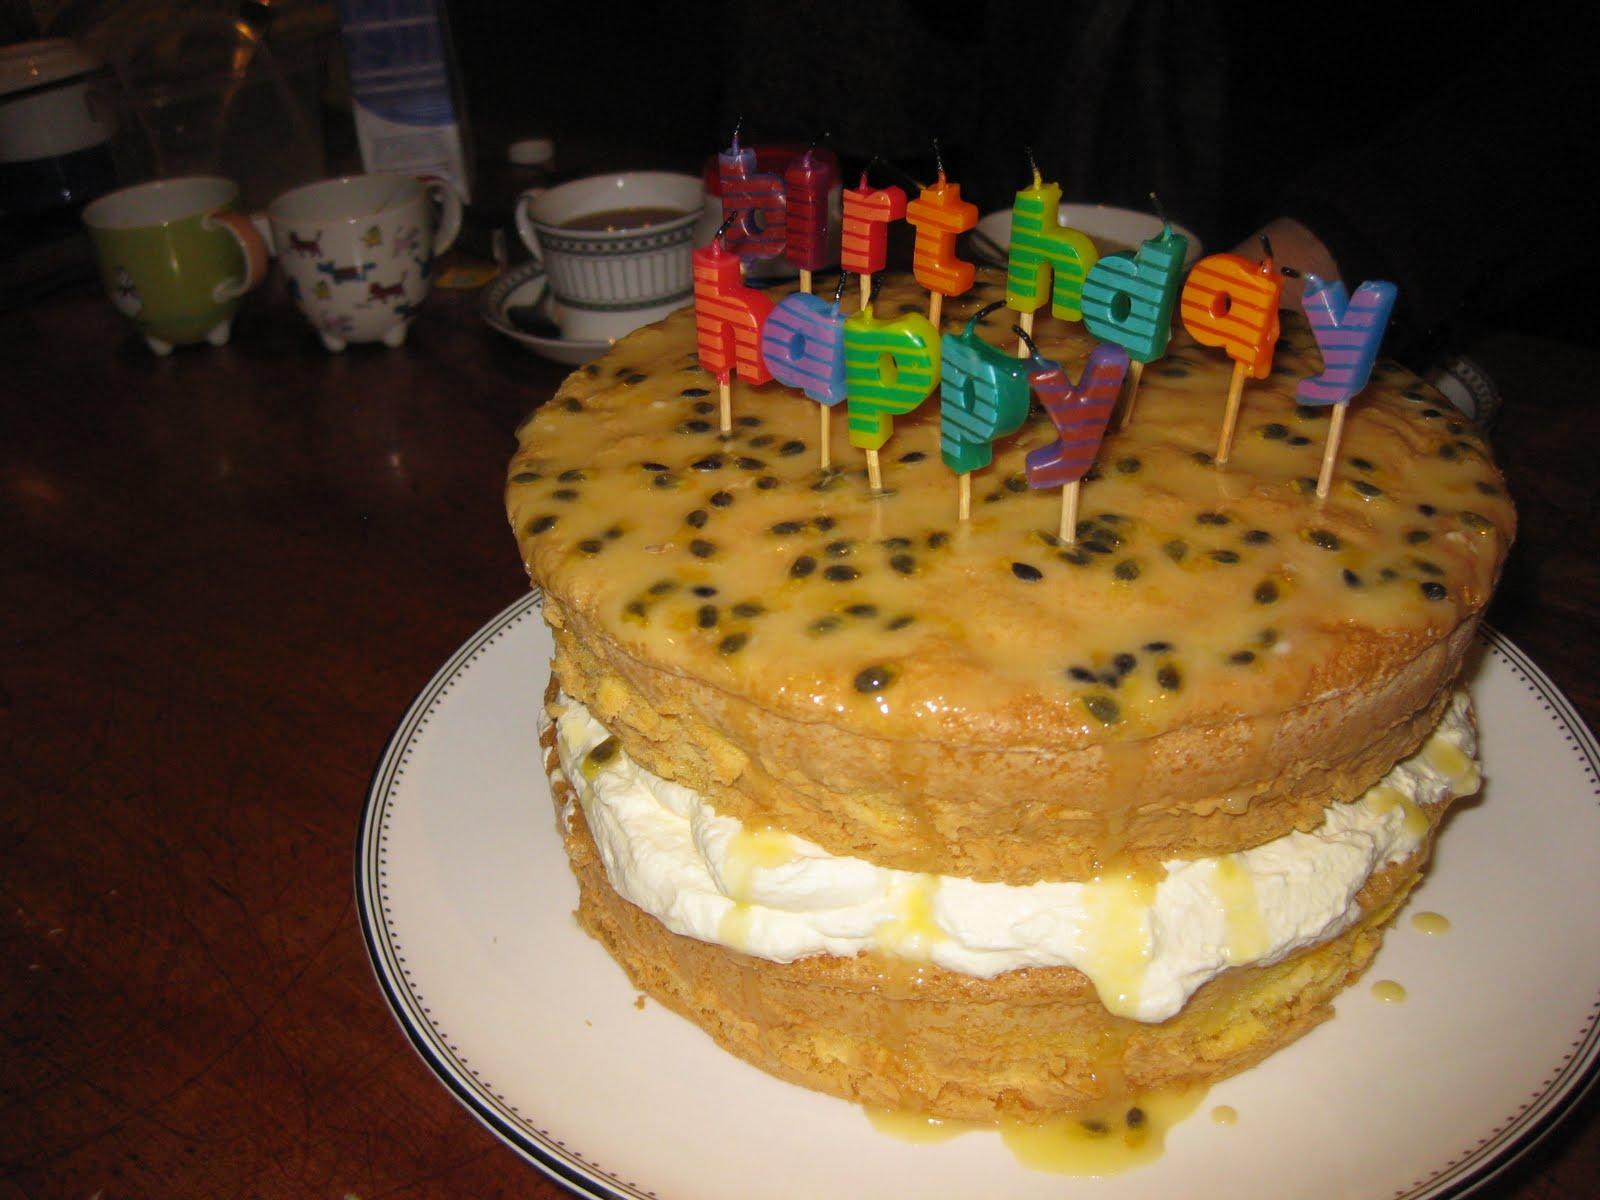 Georgiegirlcooks The Most Amazing Birthday Cake Ever